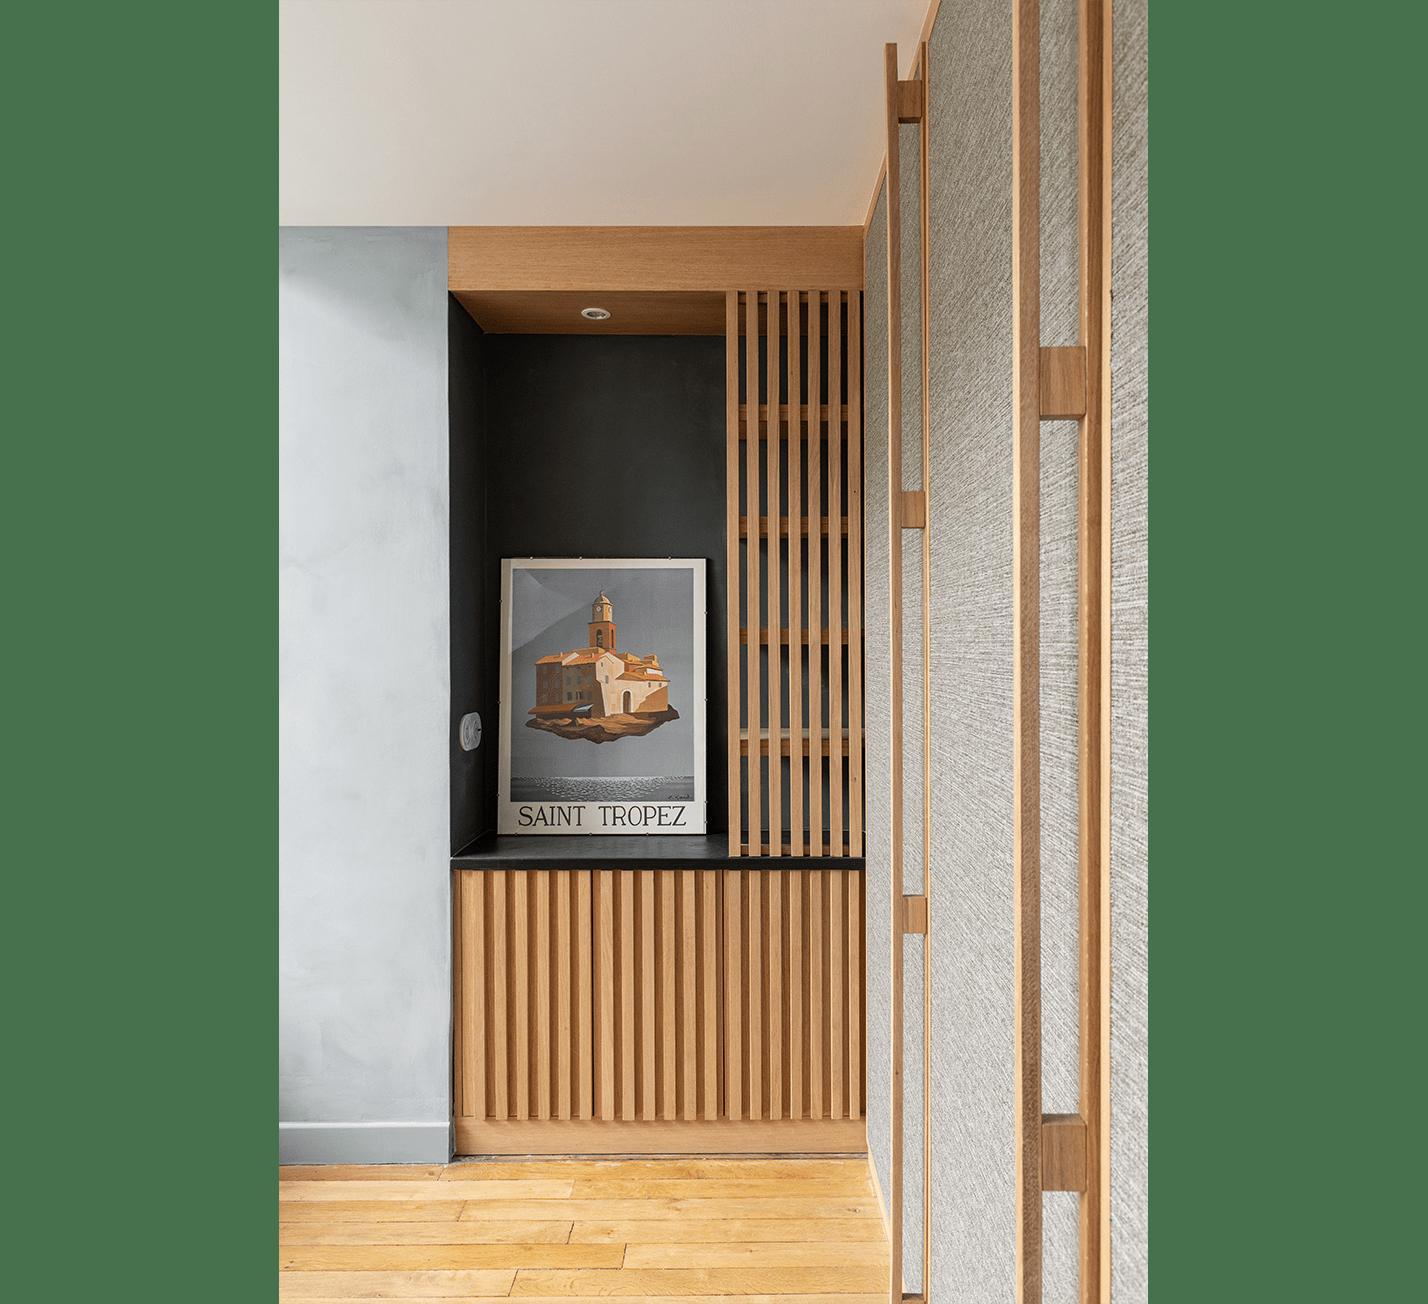 Projet-Senoch-Atelier-Steve-Pauline-Borgia-Architecte-interieur-03-min